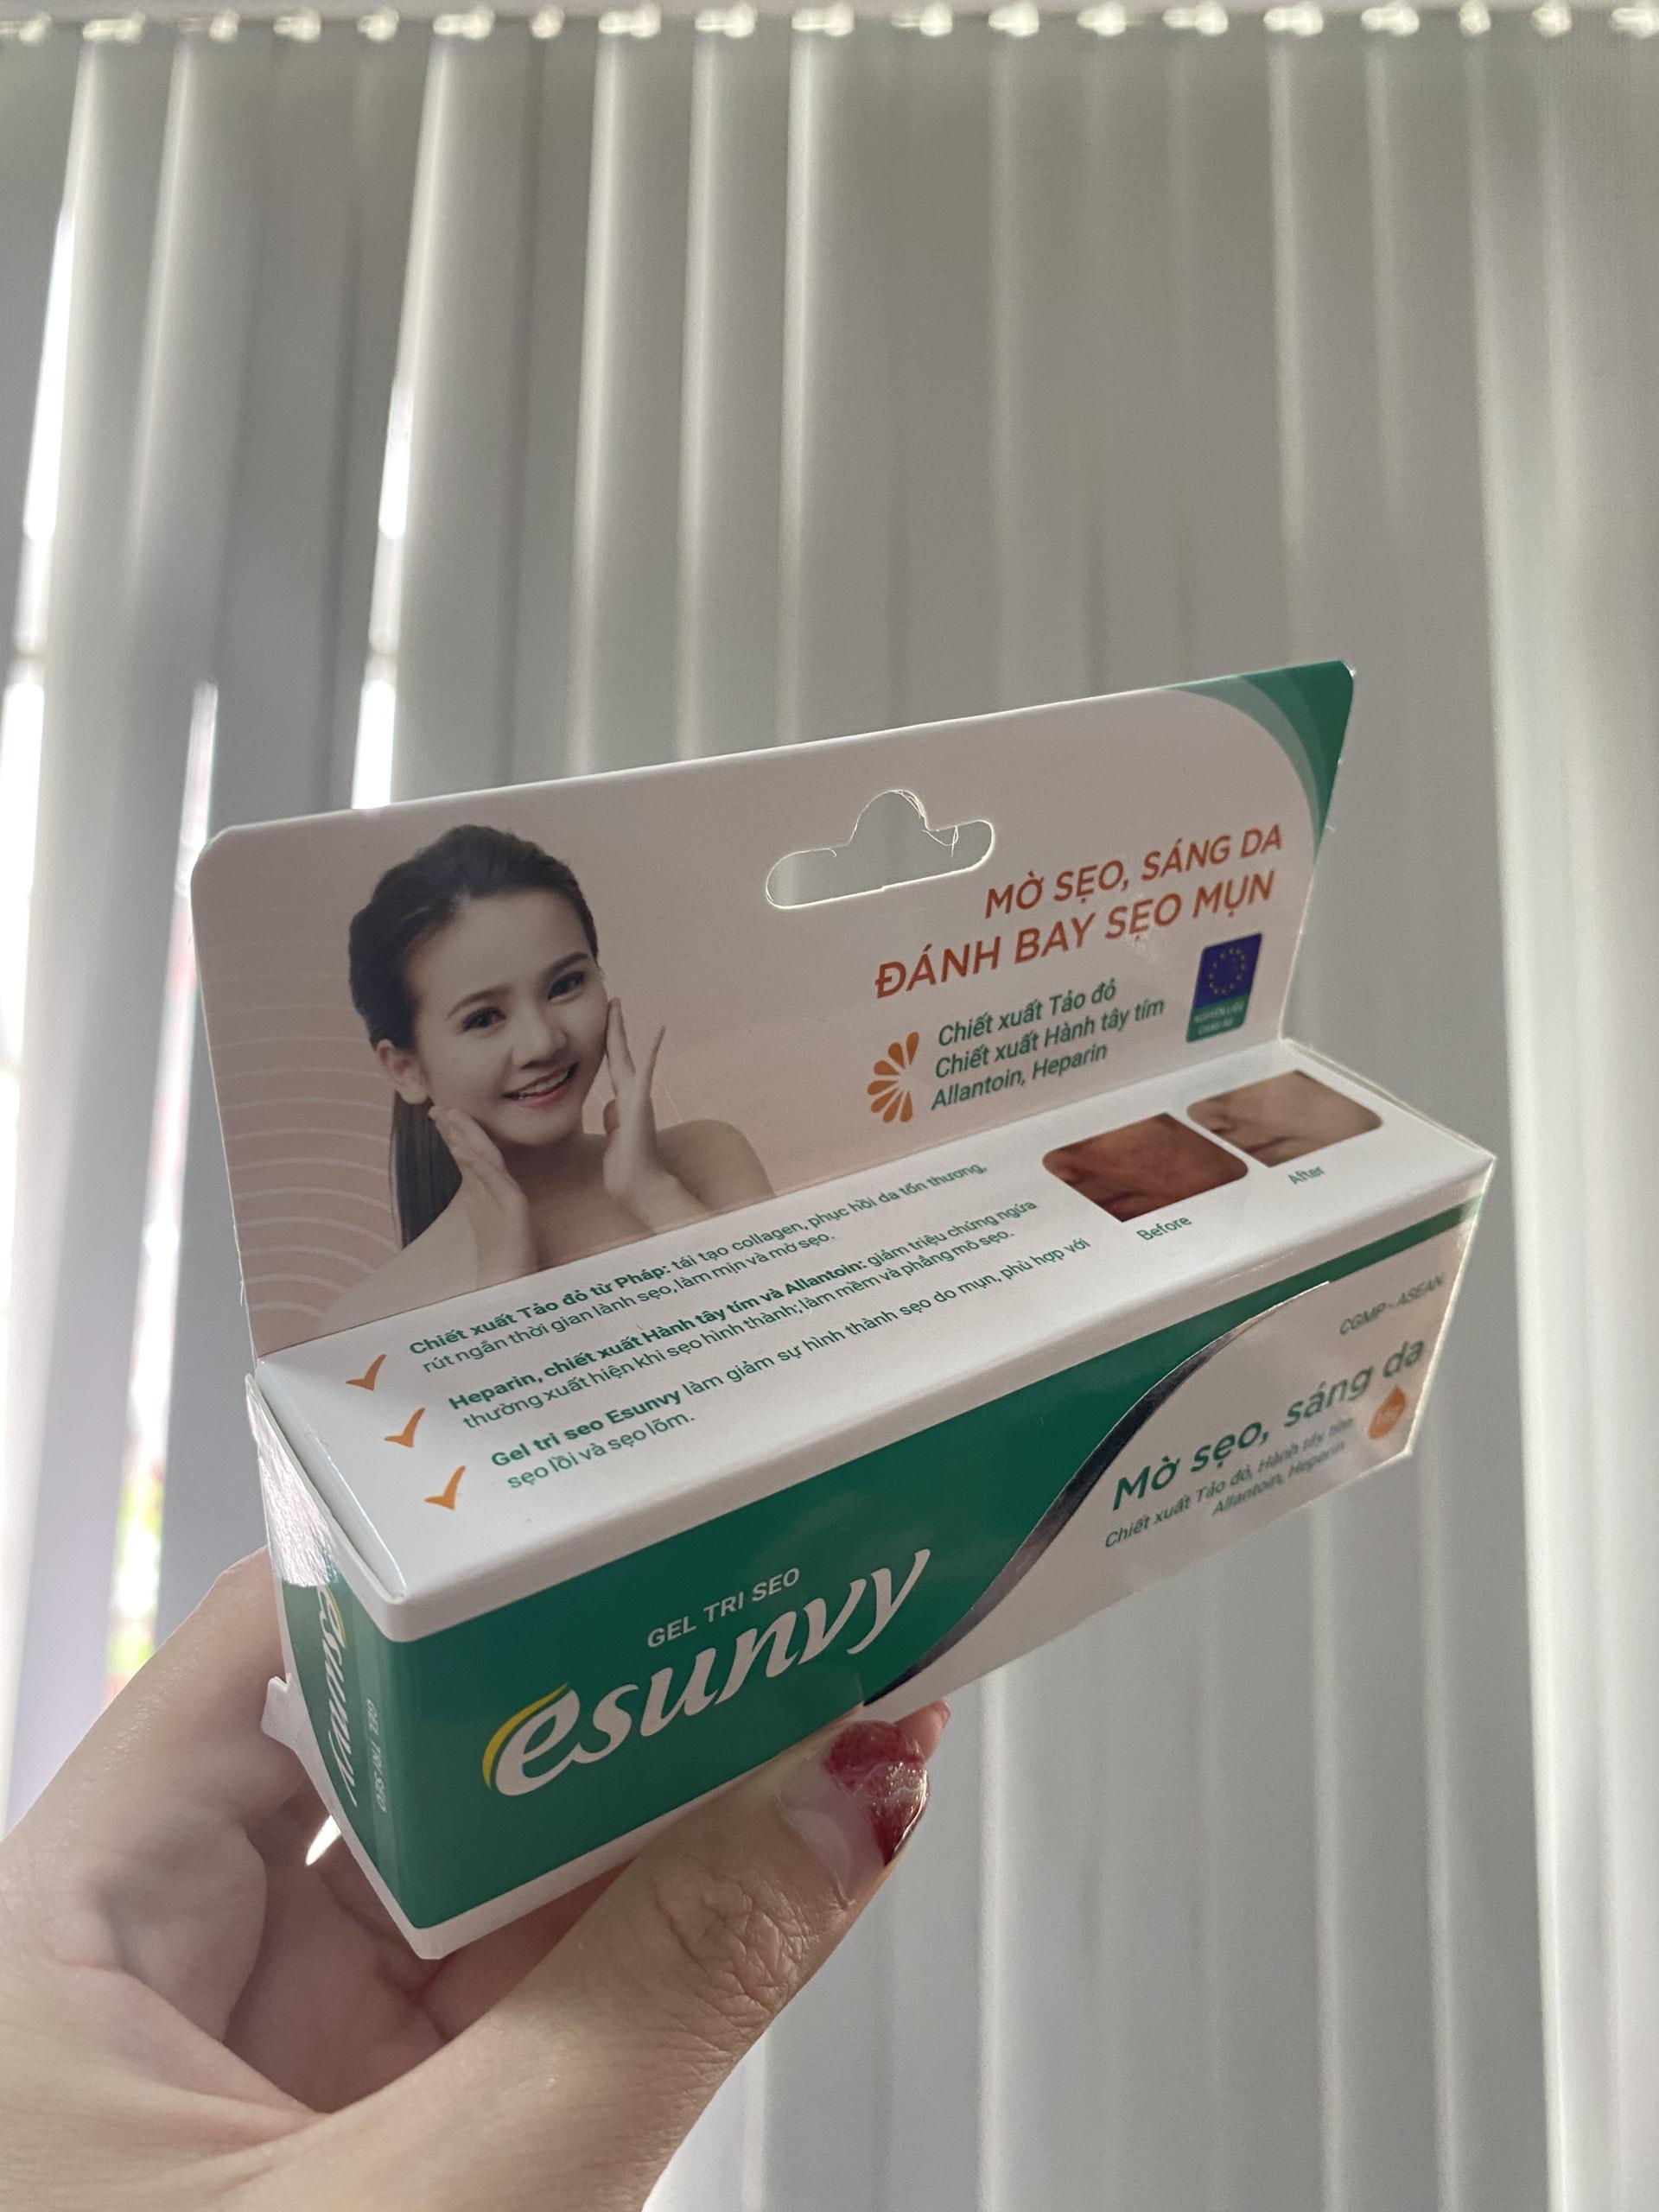 Gel Tri Seo Esunvy - Đánh bay sẹo mụn - Mờ sẹo, sáng da - Tuýp 15g